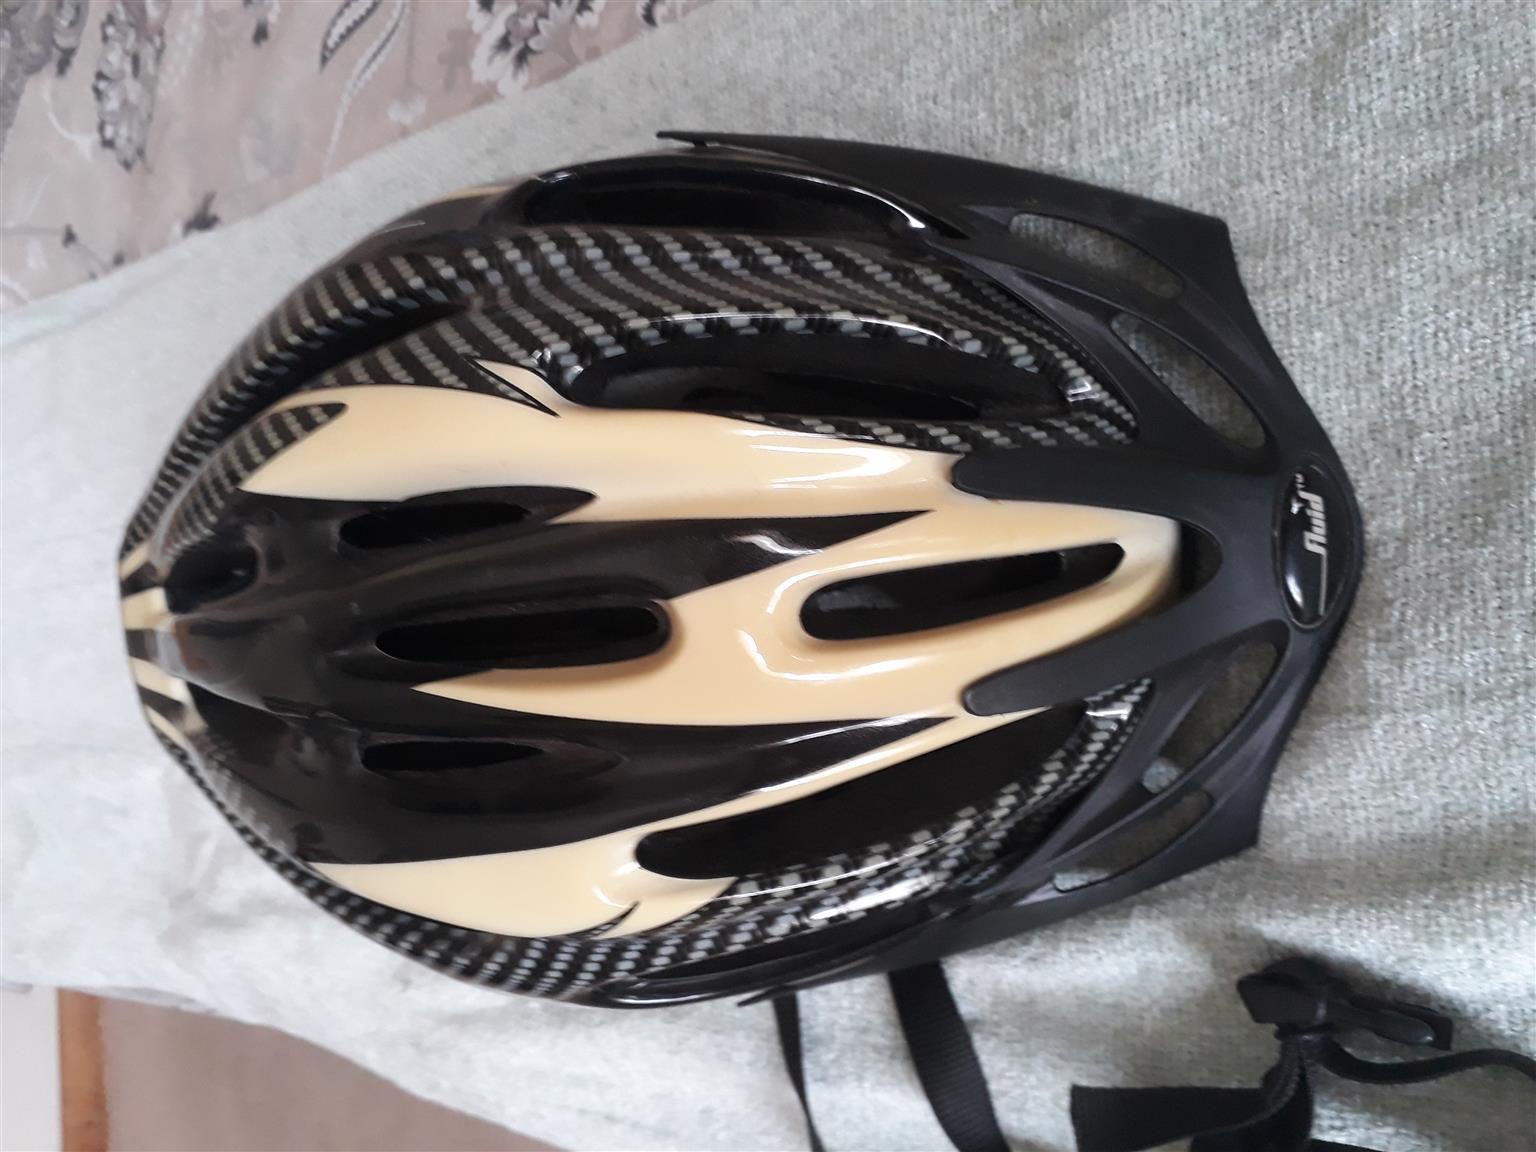 Fluid cycling helmet.